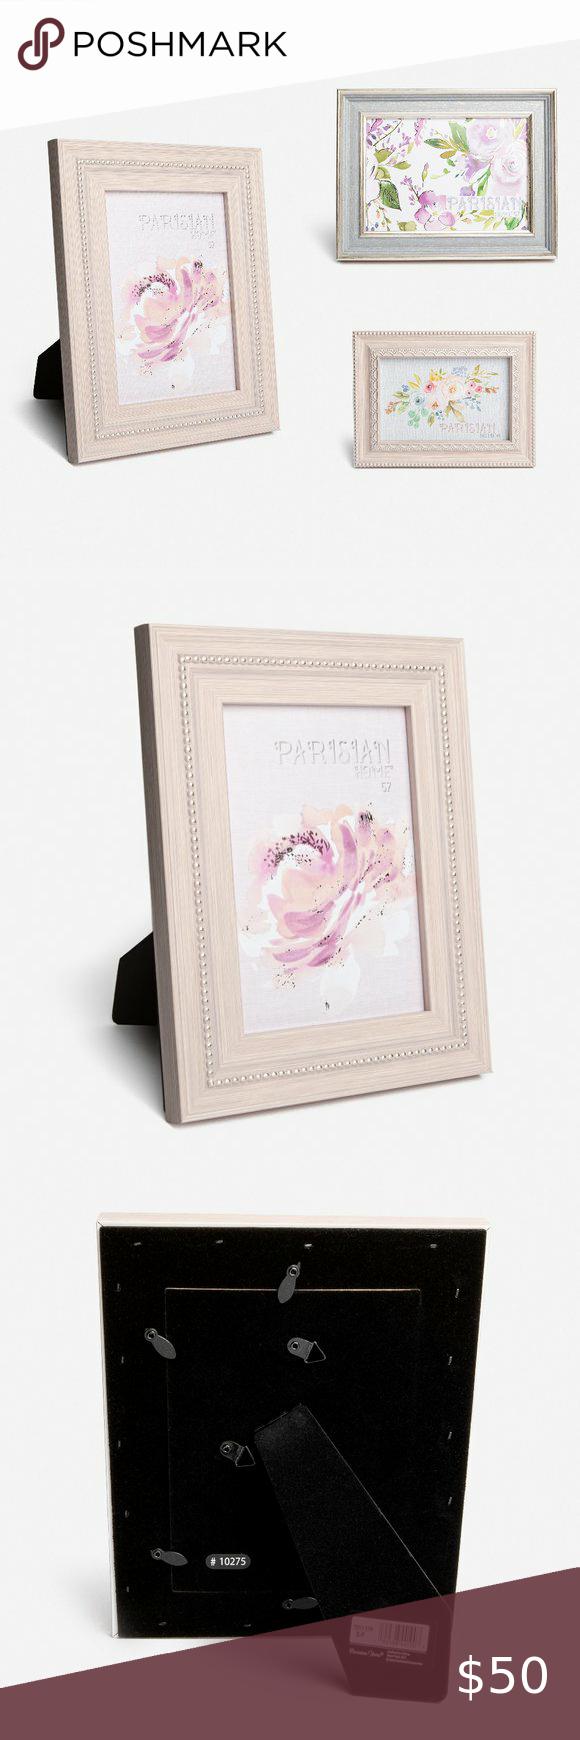 Parisian Home Frames : parisian, frames, PARISIAN, Photo, Frames, Photos, Beautiful, Parisian, Metallic, Accents., Frame, Frames,